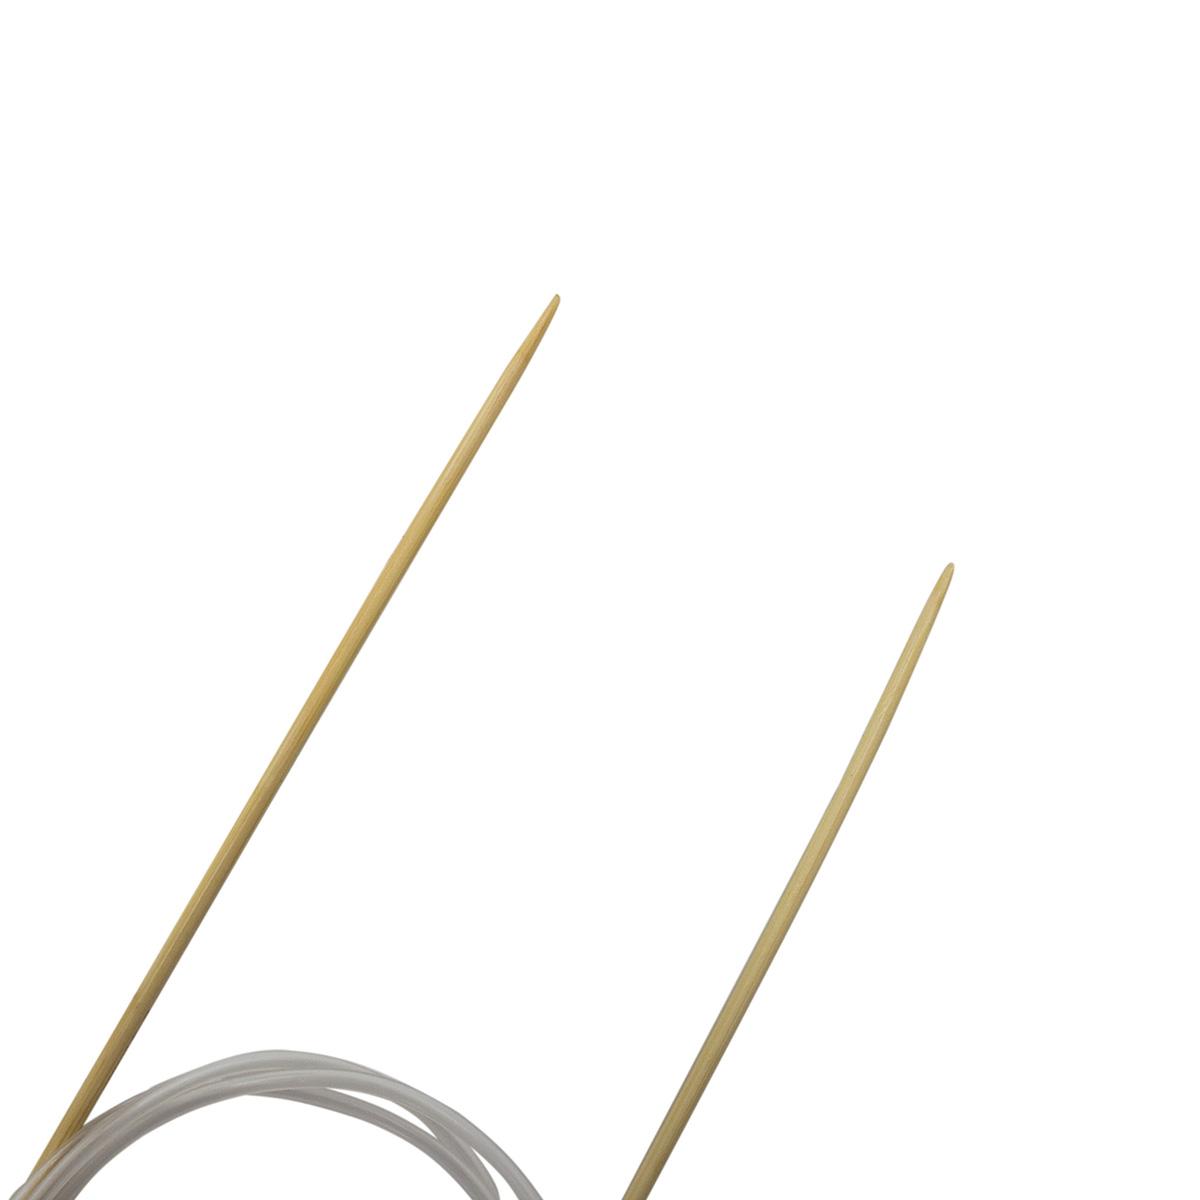 Спицы круговые бамбук 942125, 100 см, 2,5 мм, Hobby&Pro